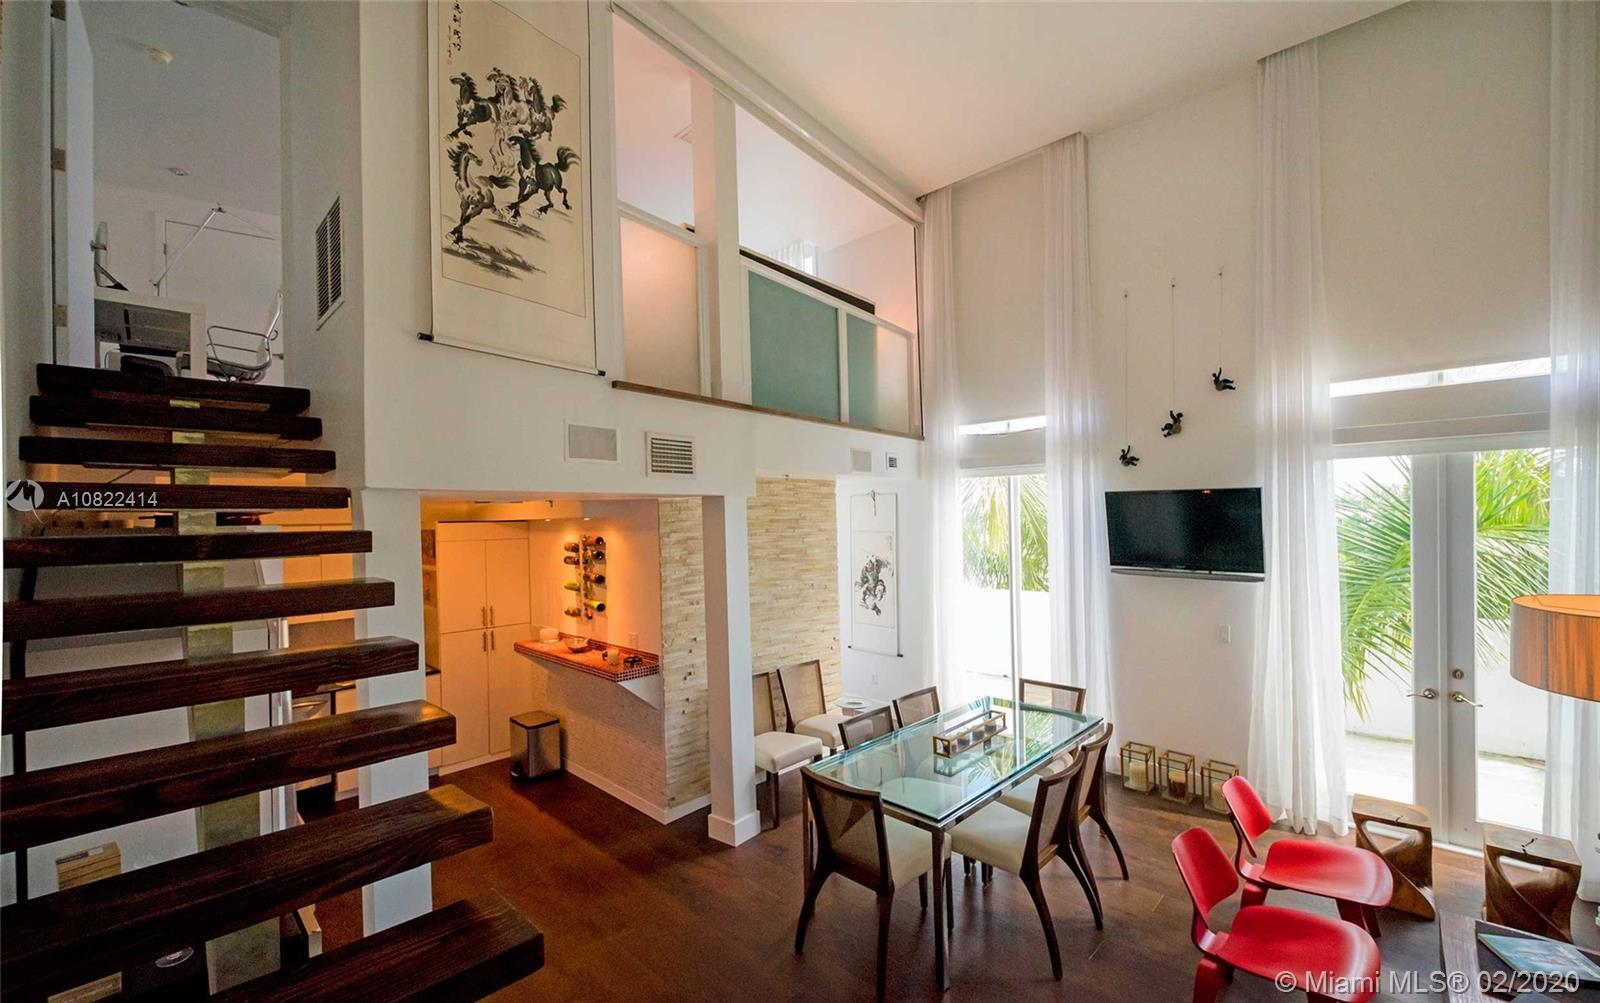 Elegant, cozy, unique loft in an exclusive 12 units private boutique building in Miami Beach. Unit h